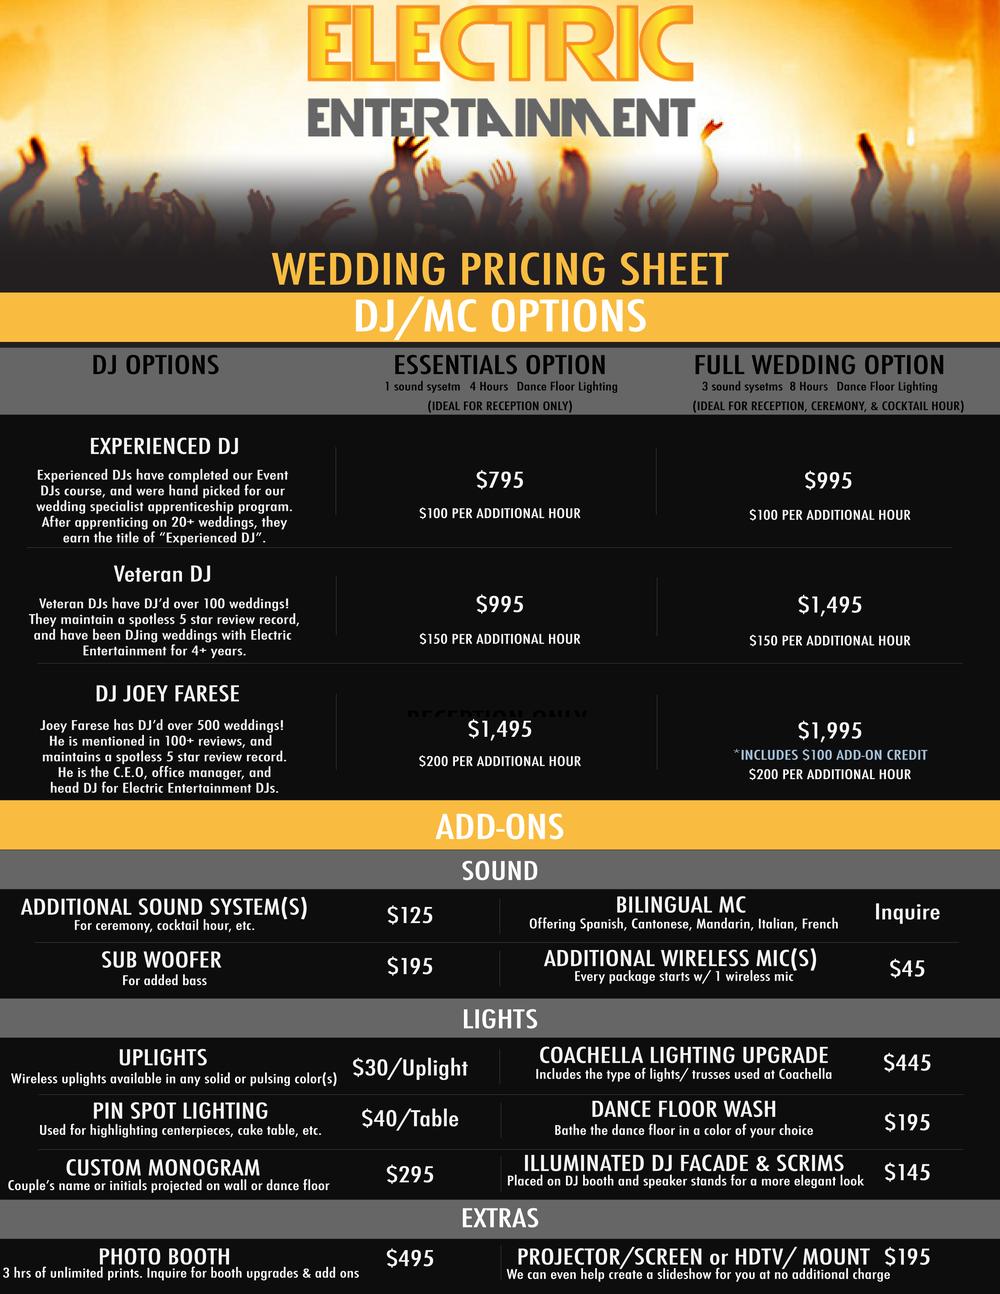 2019 wedding pricing sheet v3 DRAFT-01.png